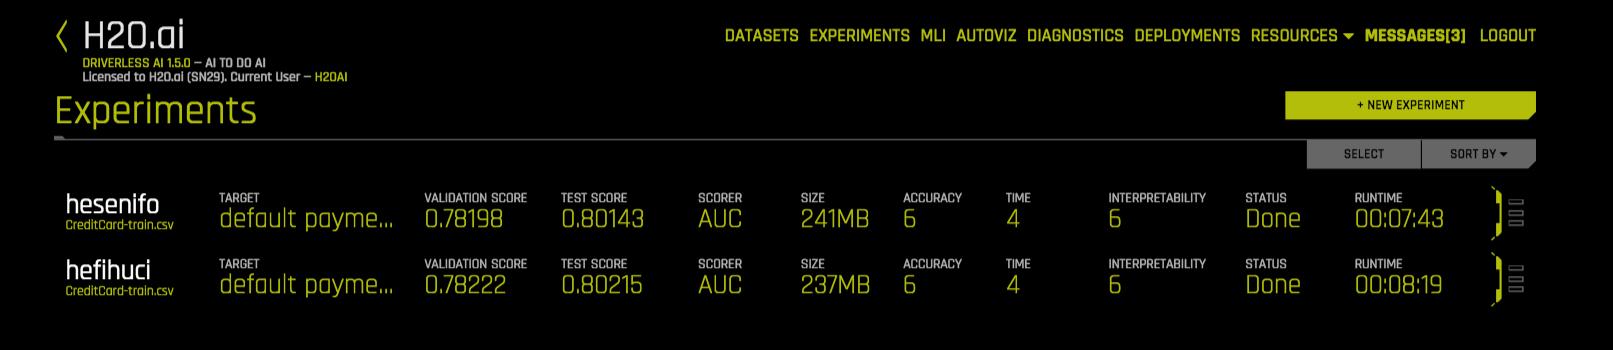 Credit Card Demo — Using Driverless AI 1 5 3 documentation